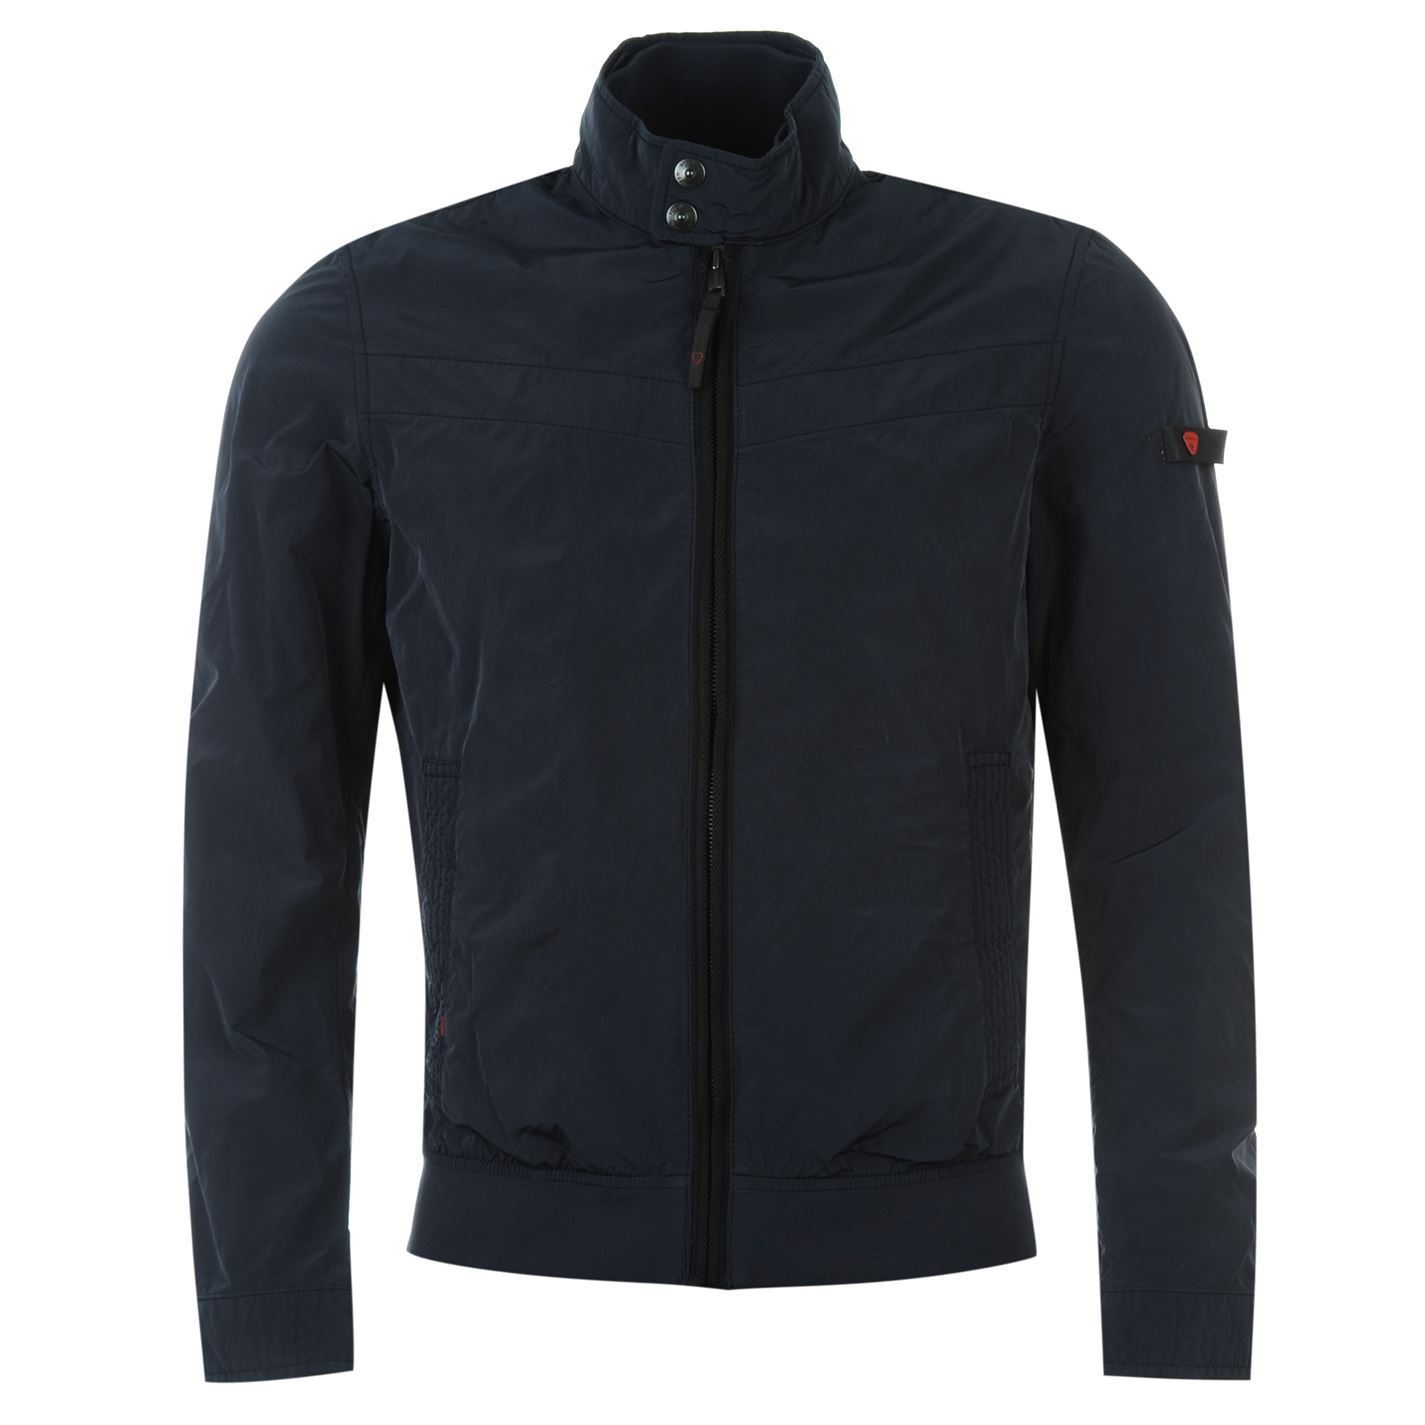 swiss cross by strellson mens jacket long sleeve full zip. Black Bedroom Furniture Sets. Home Design Ideas